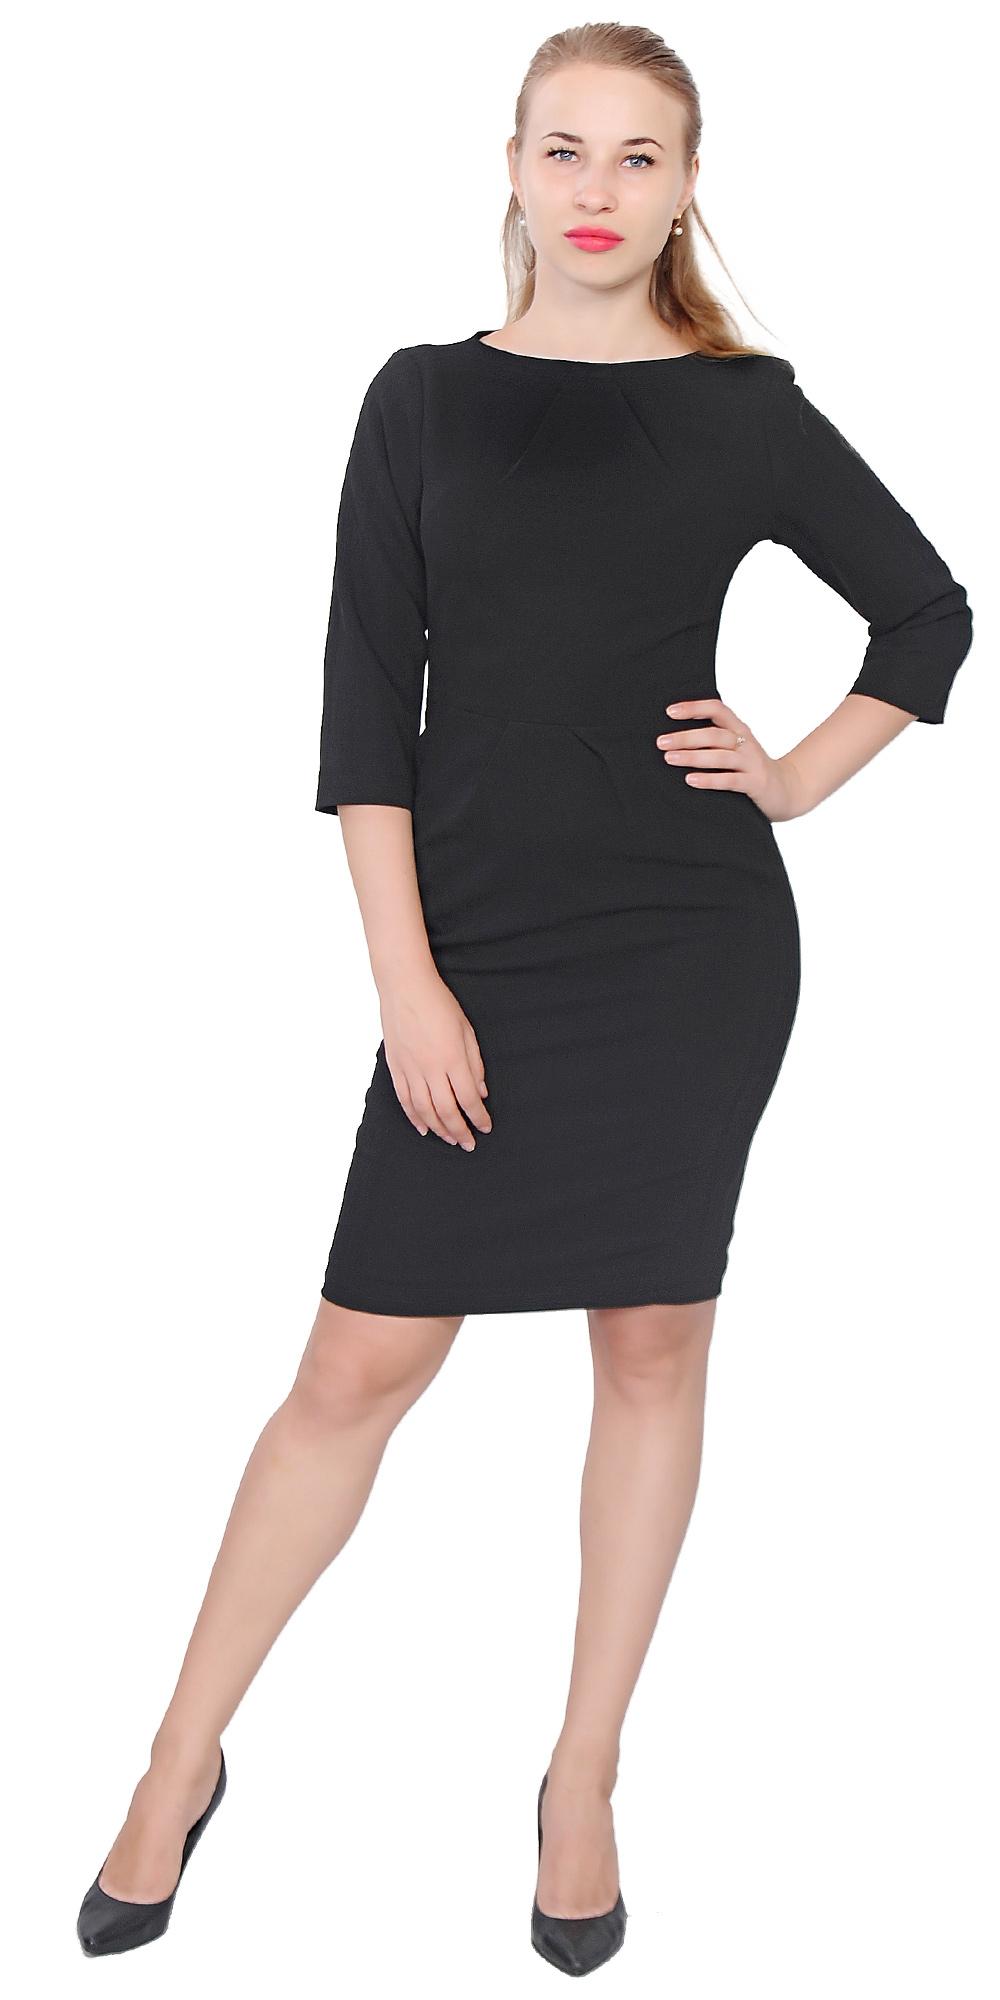 Black dress office - Womens Elegant Classy Work Dress Office Business Long